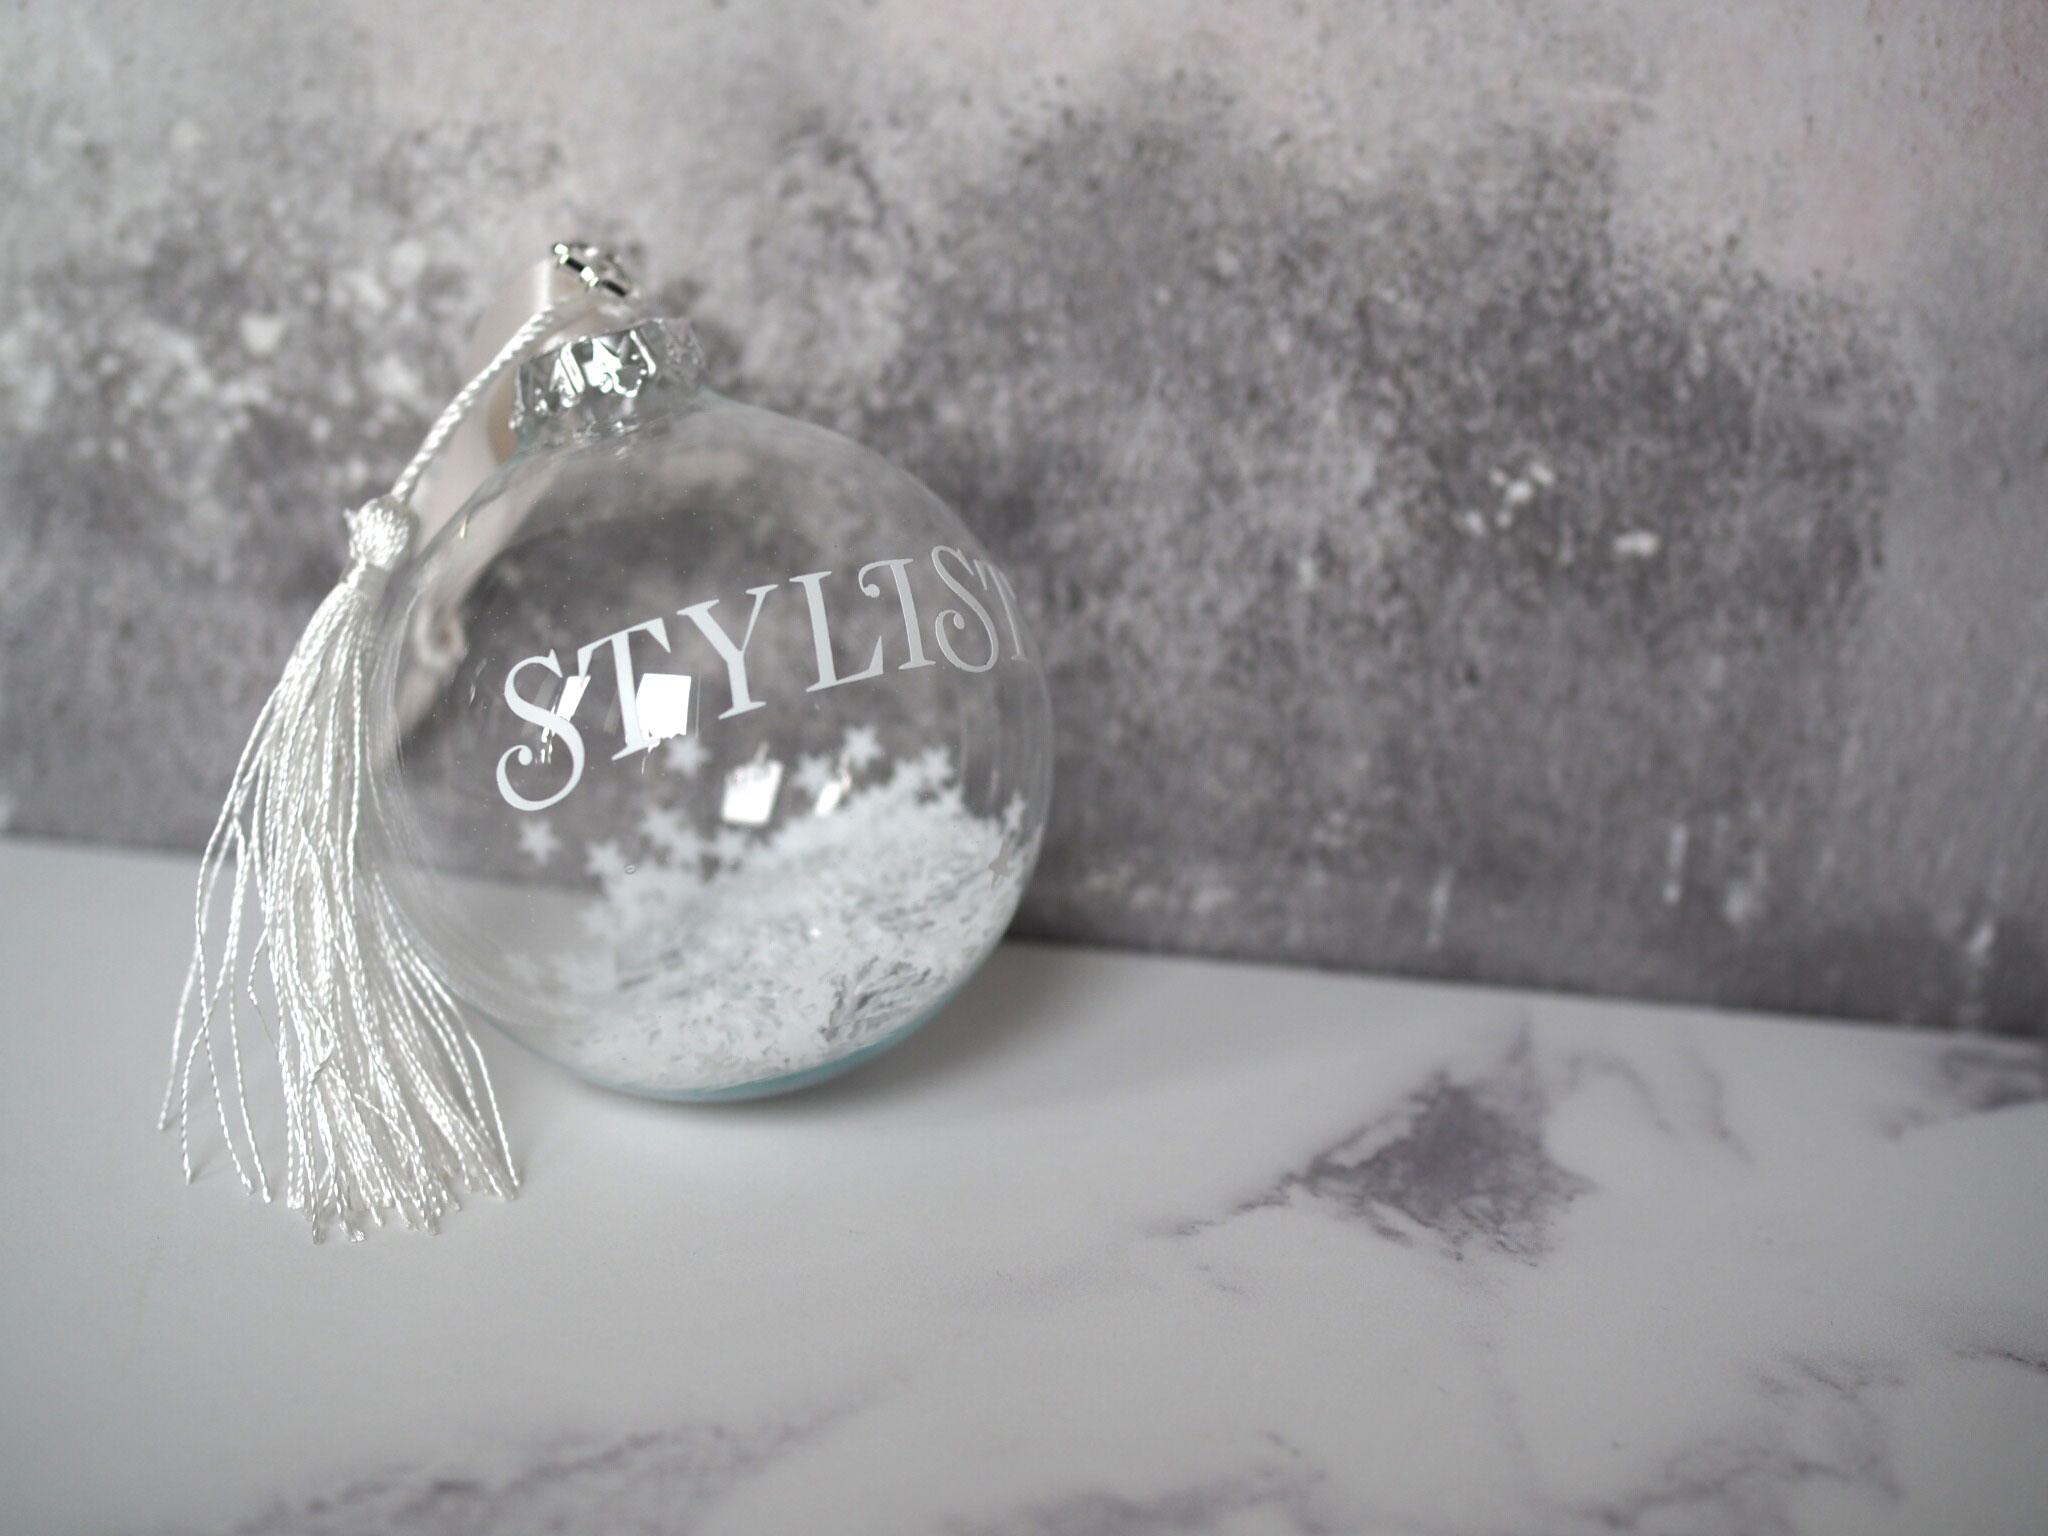 Stylist-Magazine-Branded-Christmas-Bauble.jpg